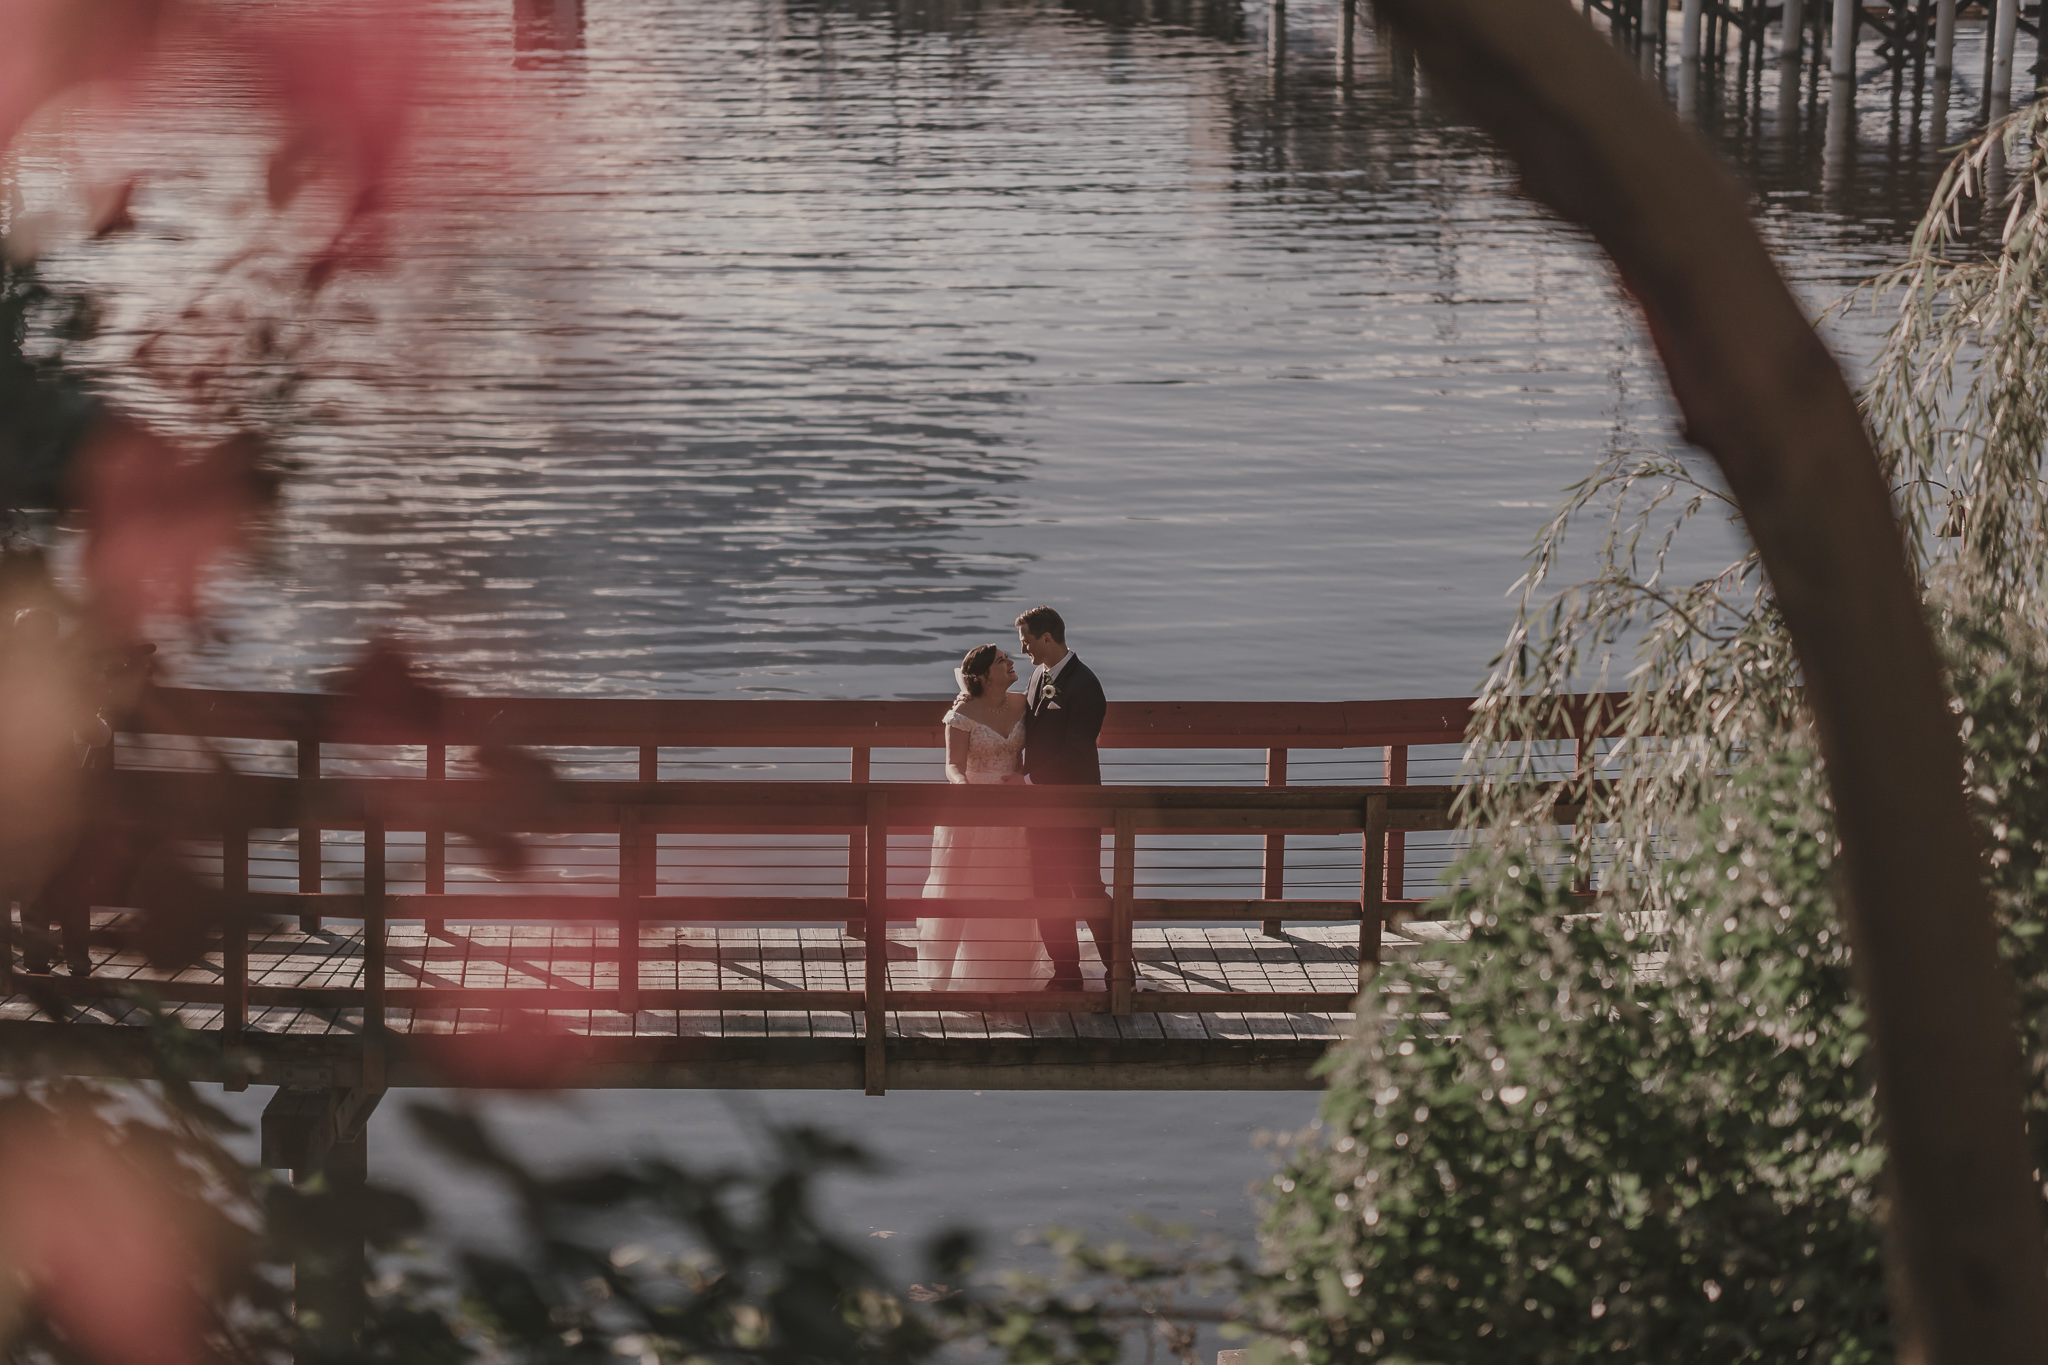 Kim and Pats Wedding Photo on bridge